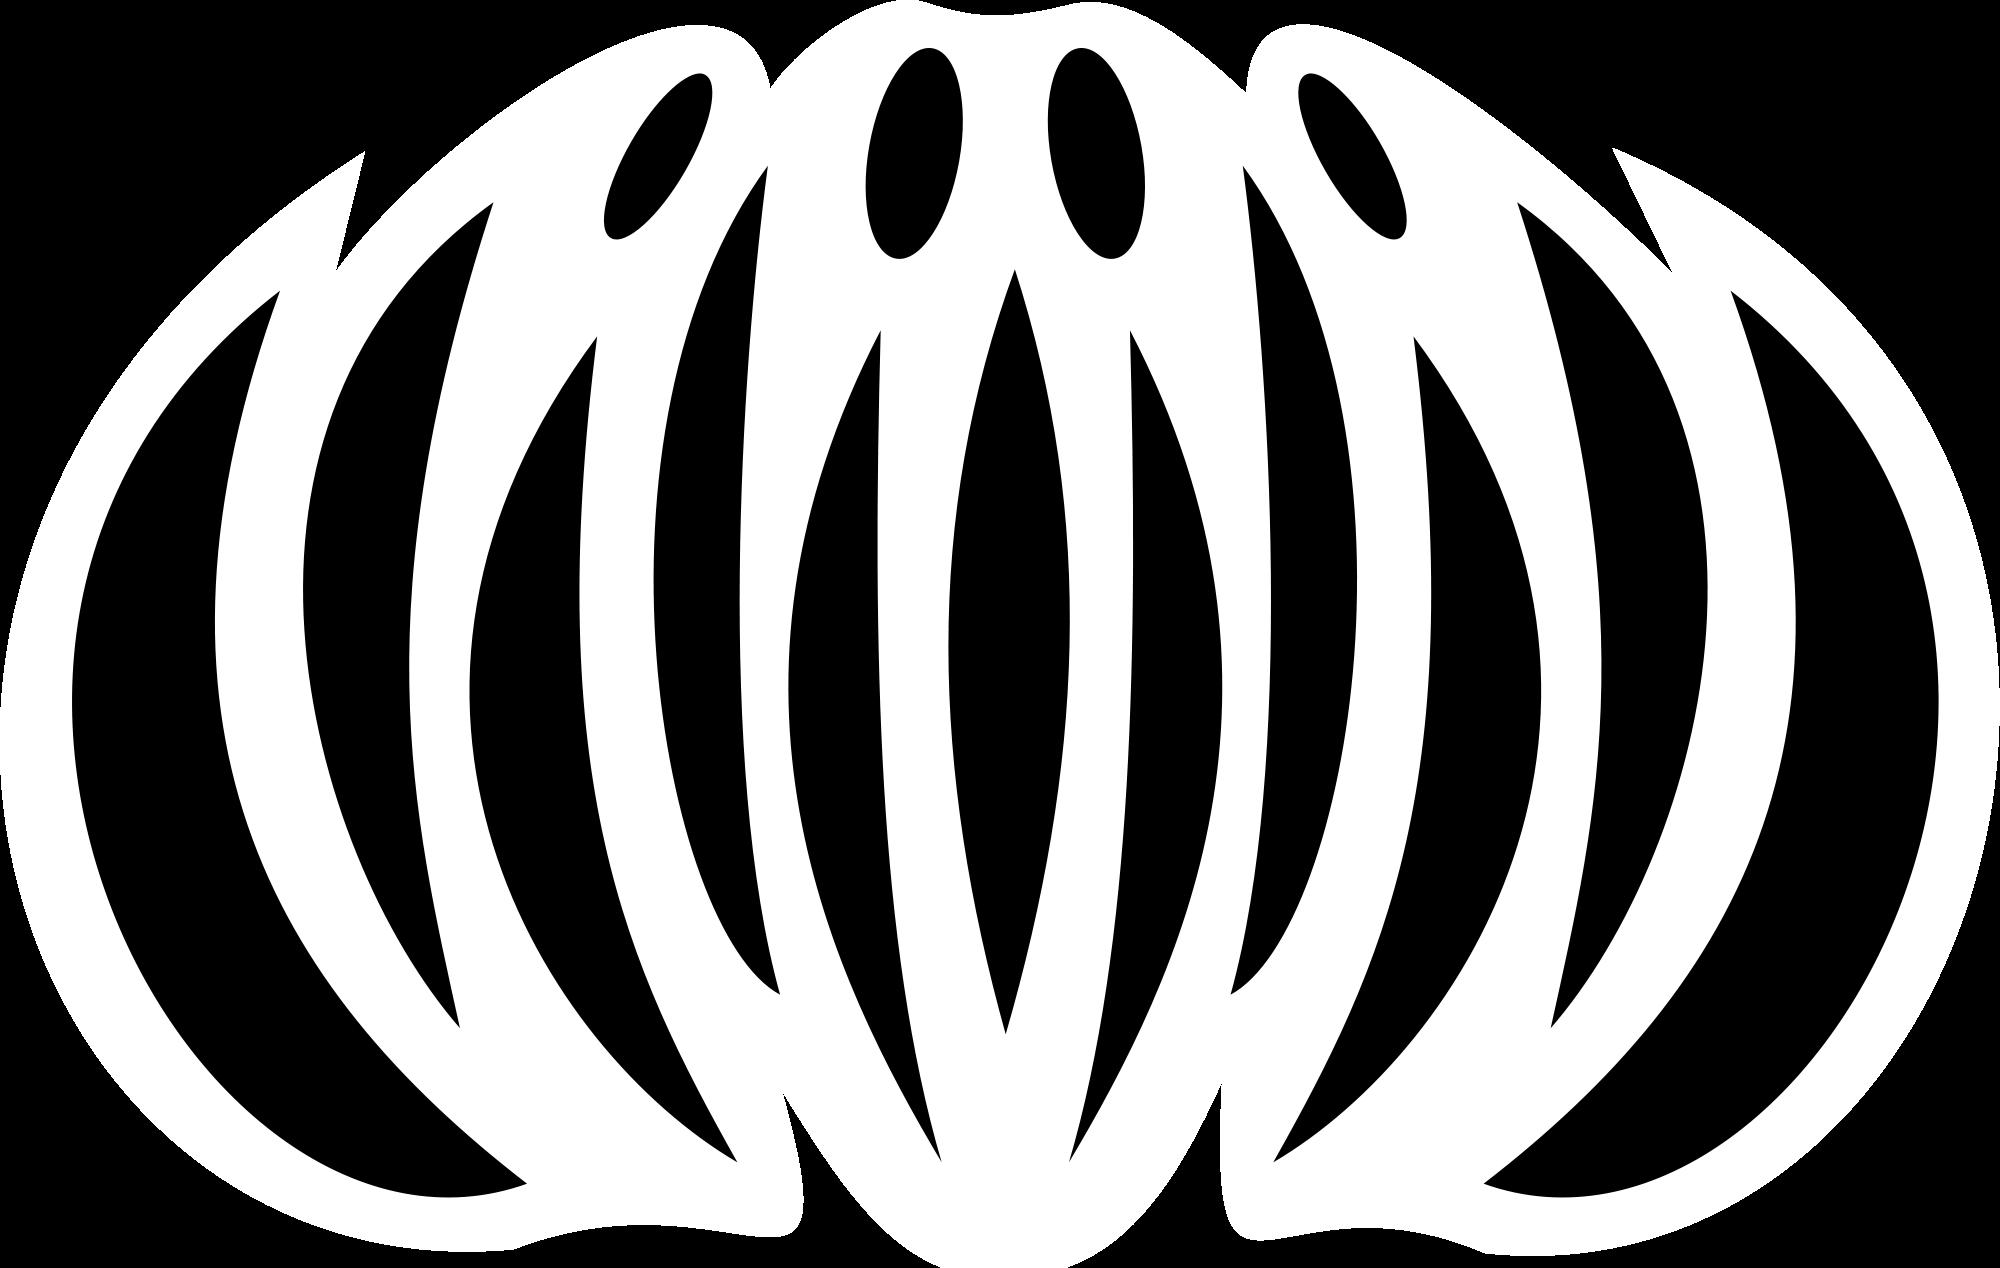 Chrysanthemum svg #4, Download drawings